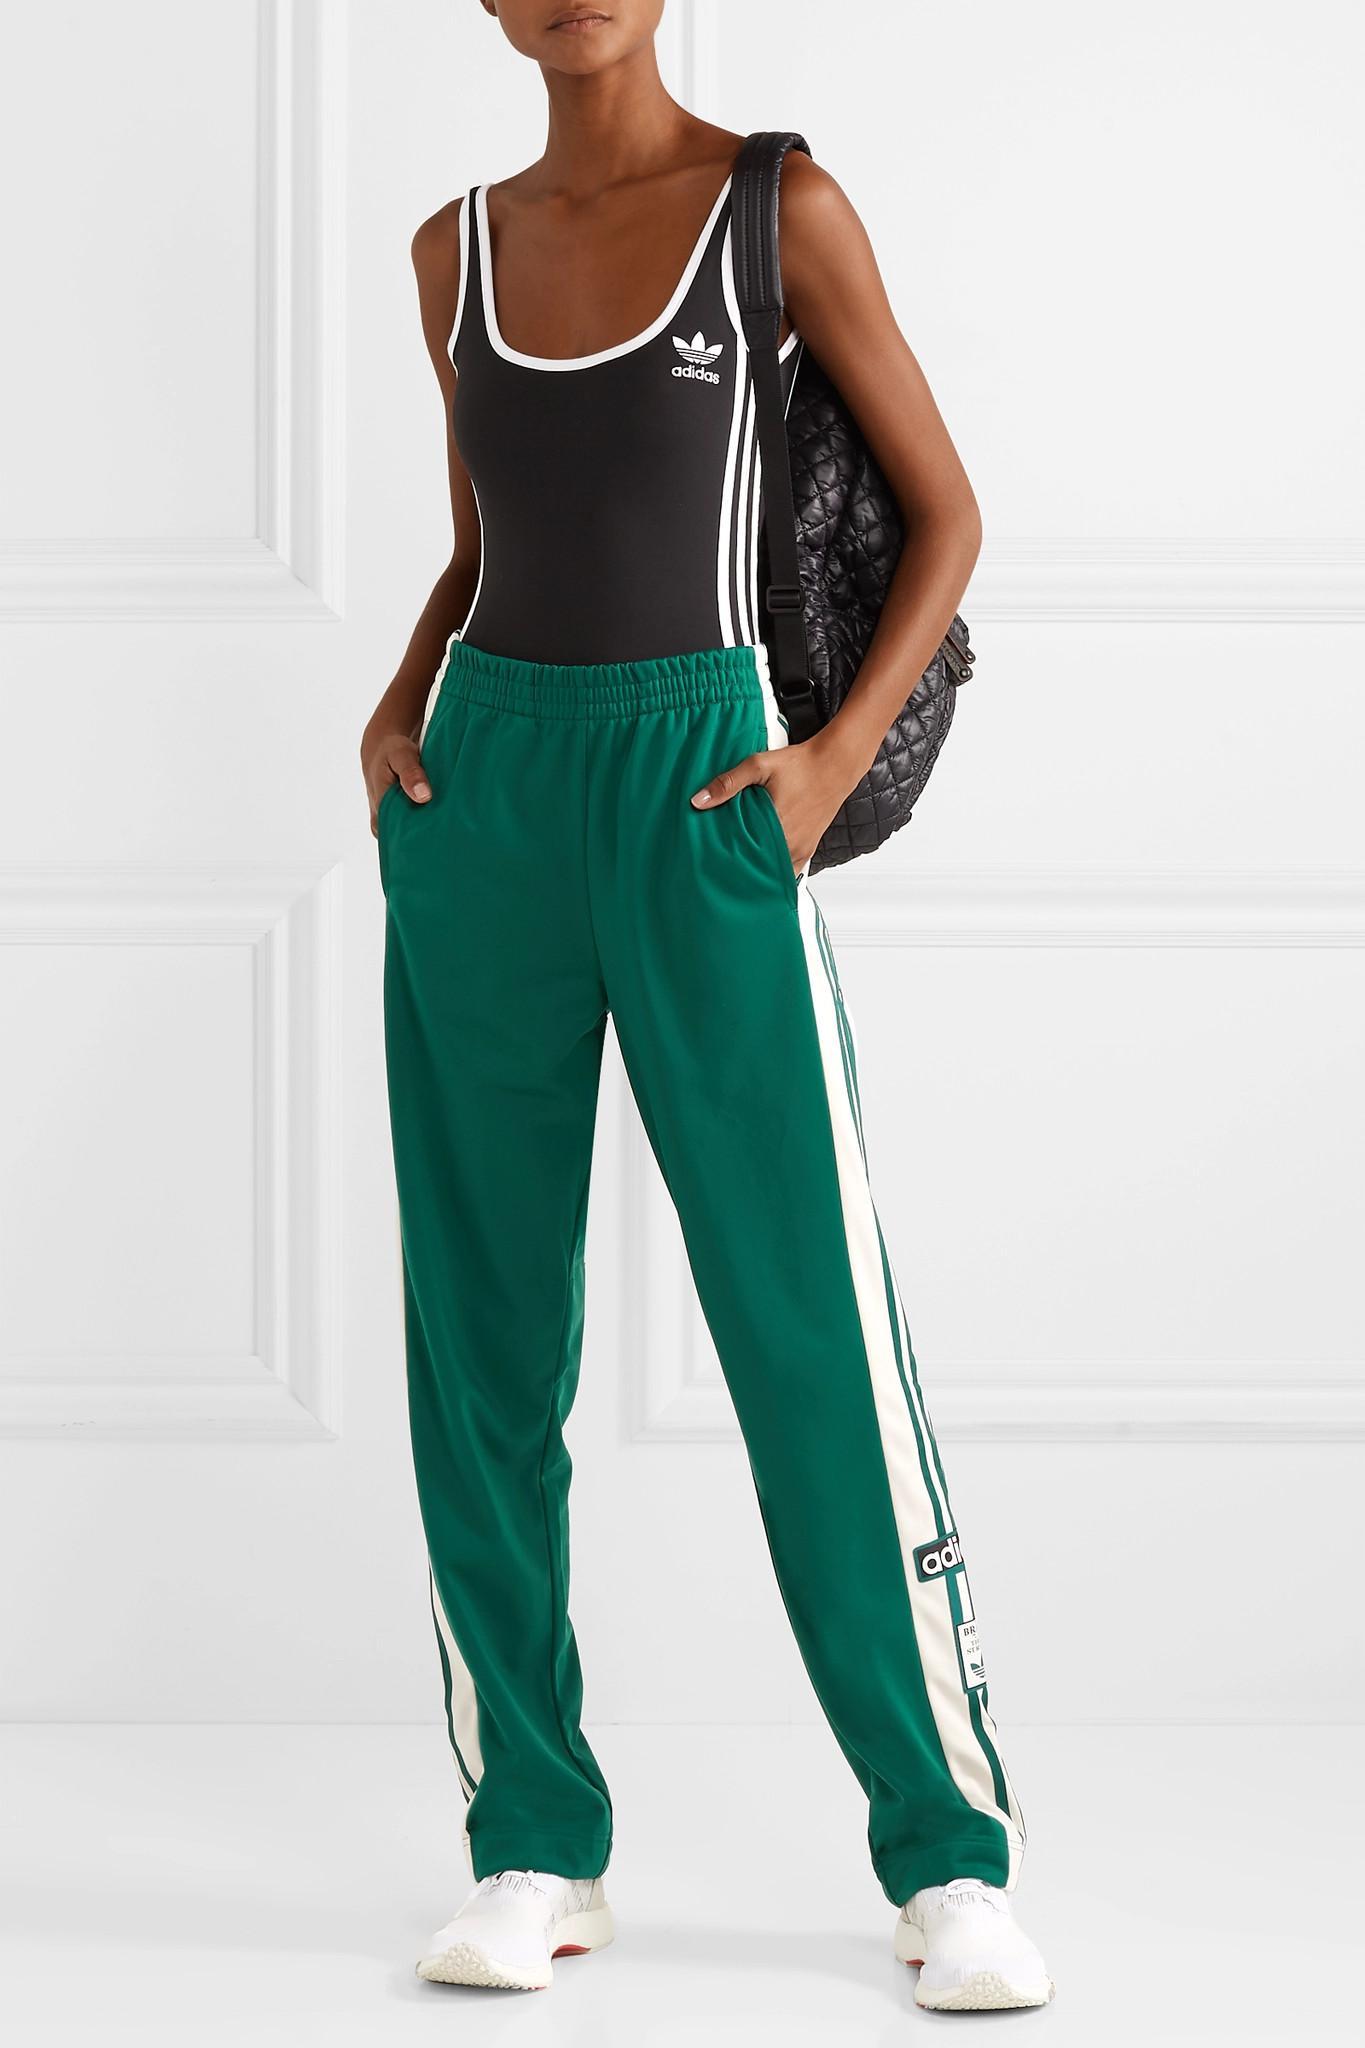 Adidas Striped Pants Satin Track In Lyst Jersey Originals Adibreak tSdxZw